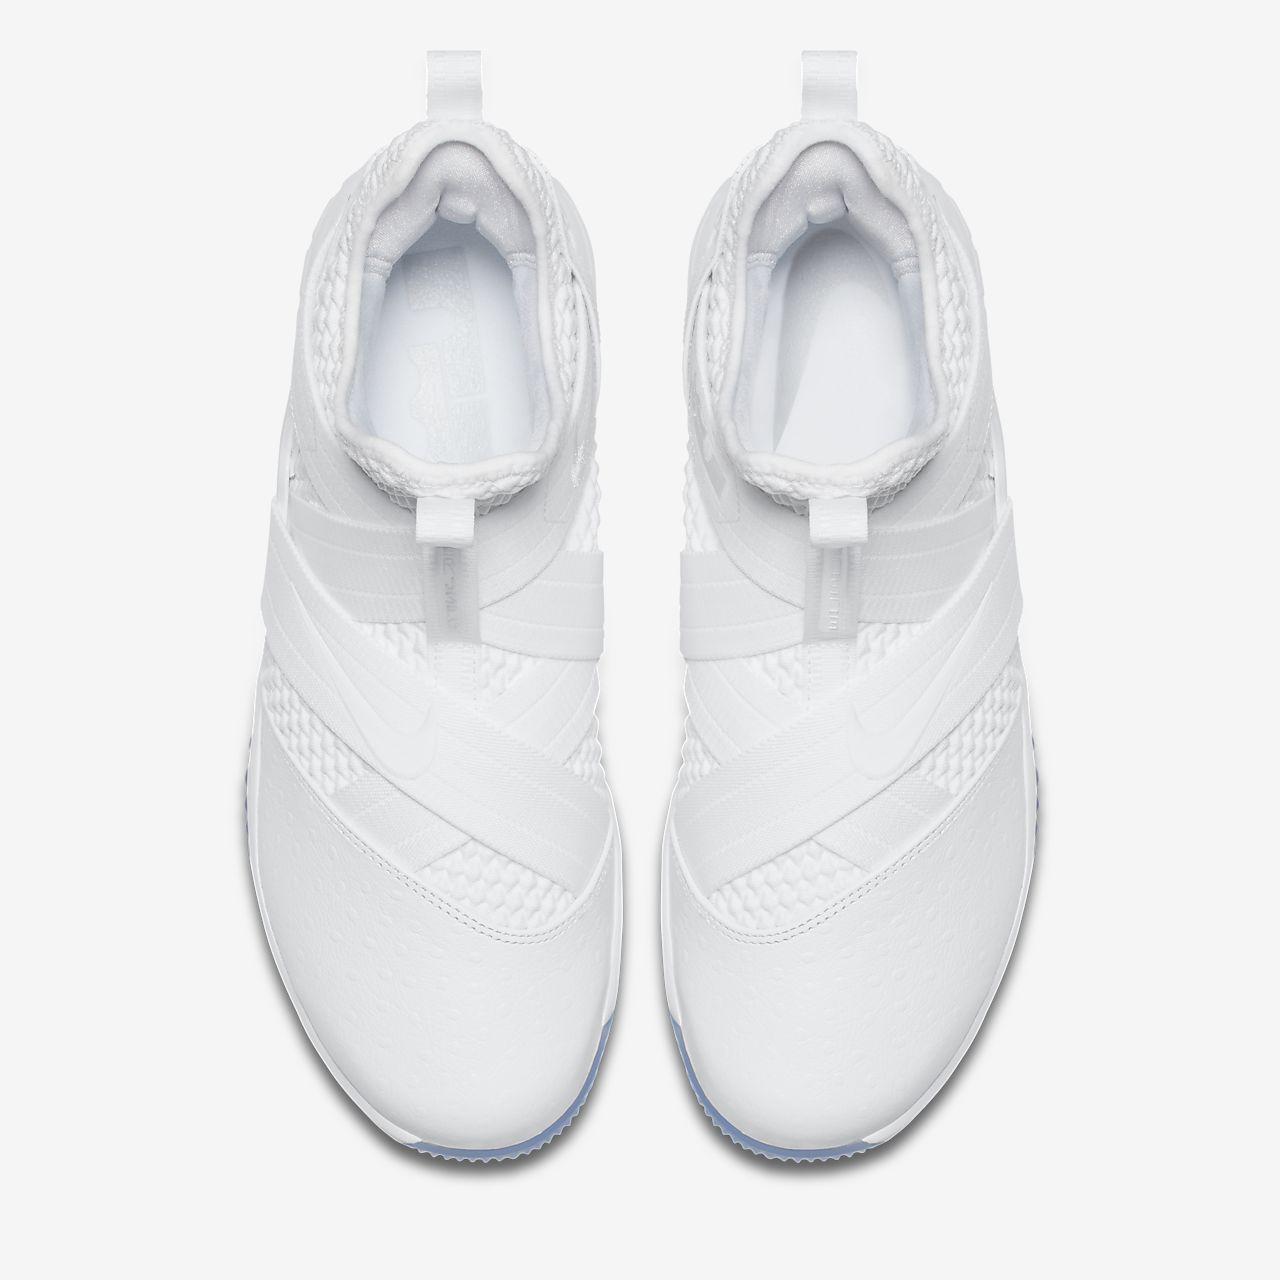 free shipping 6b303 02e28 ... Chaussure de basketball LeBron Soldier 12 SFG